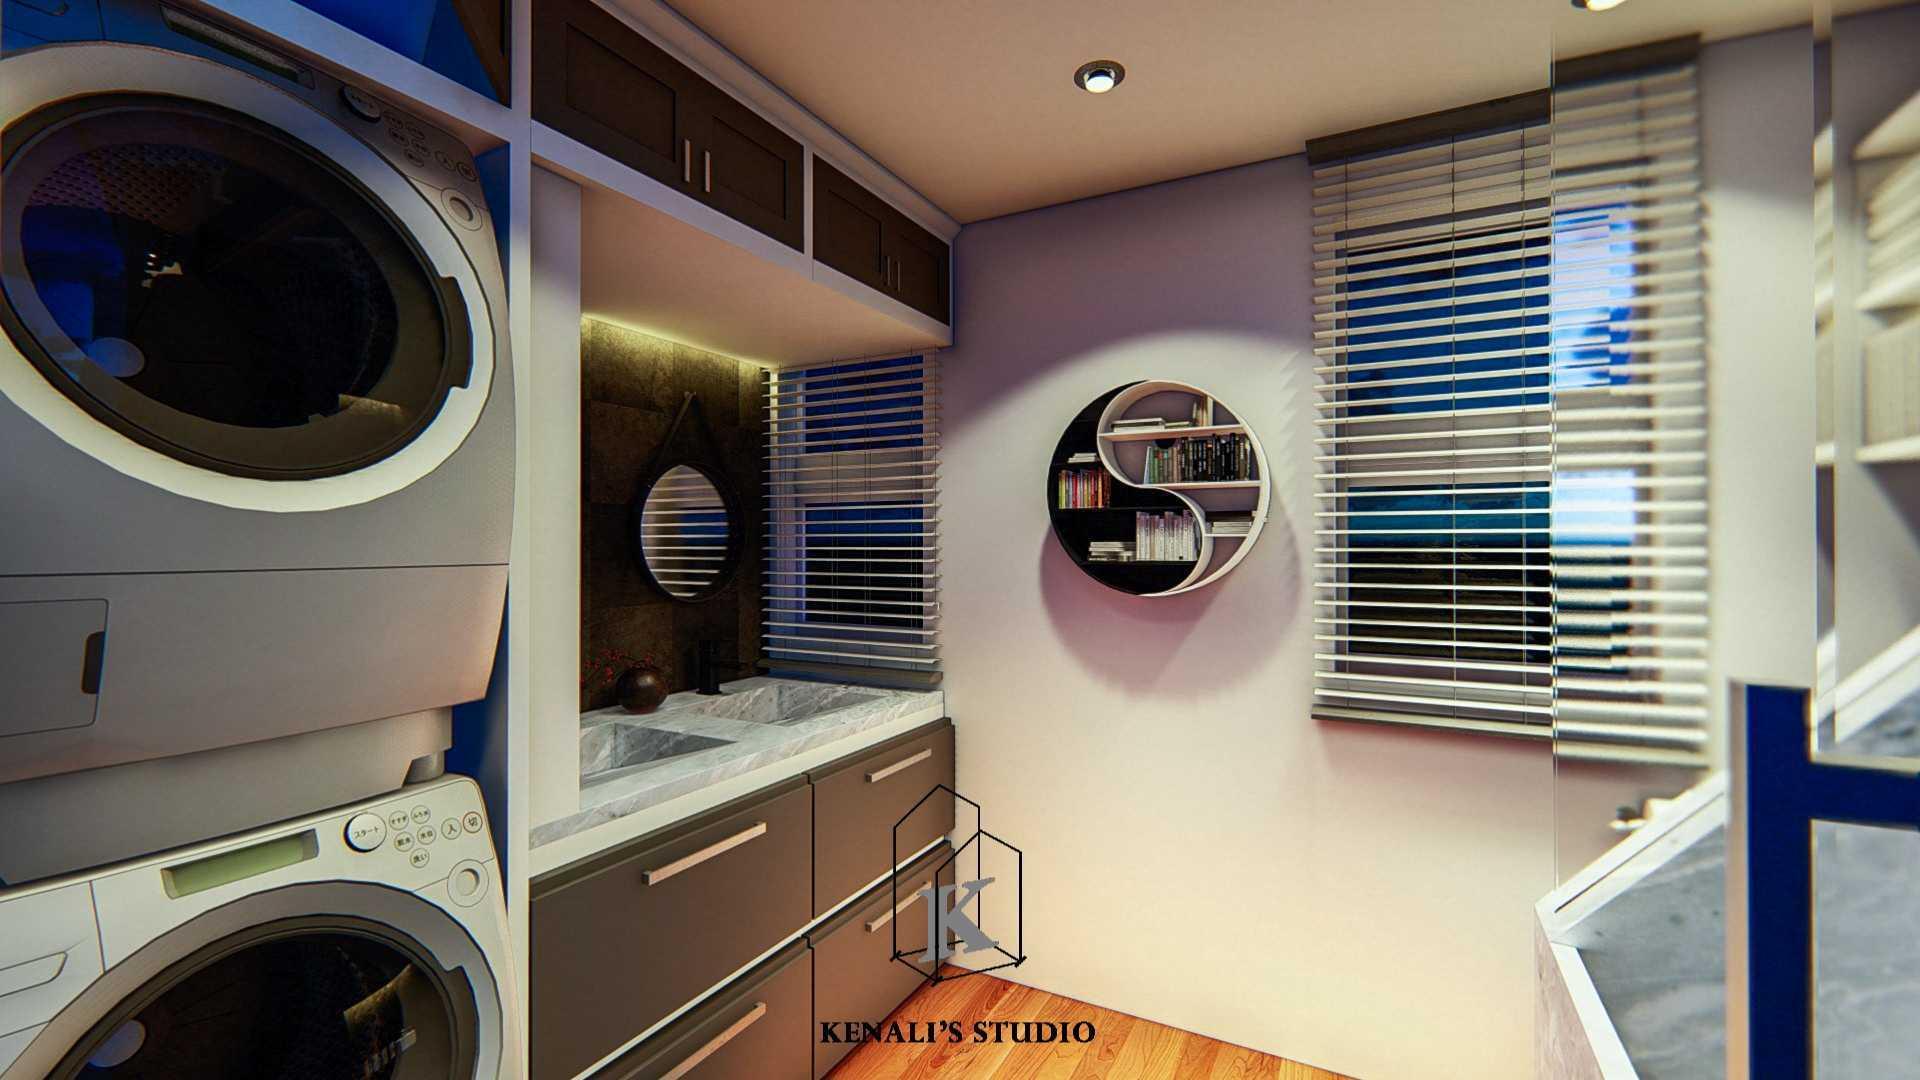 Kenali's Studio Project : Laundry & Bathroom Amerika Serikat Amerika Serikat Kenalis-Studio-Project-Laundry-Bathroom  72917